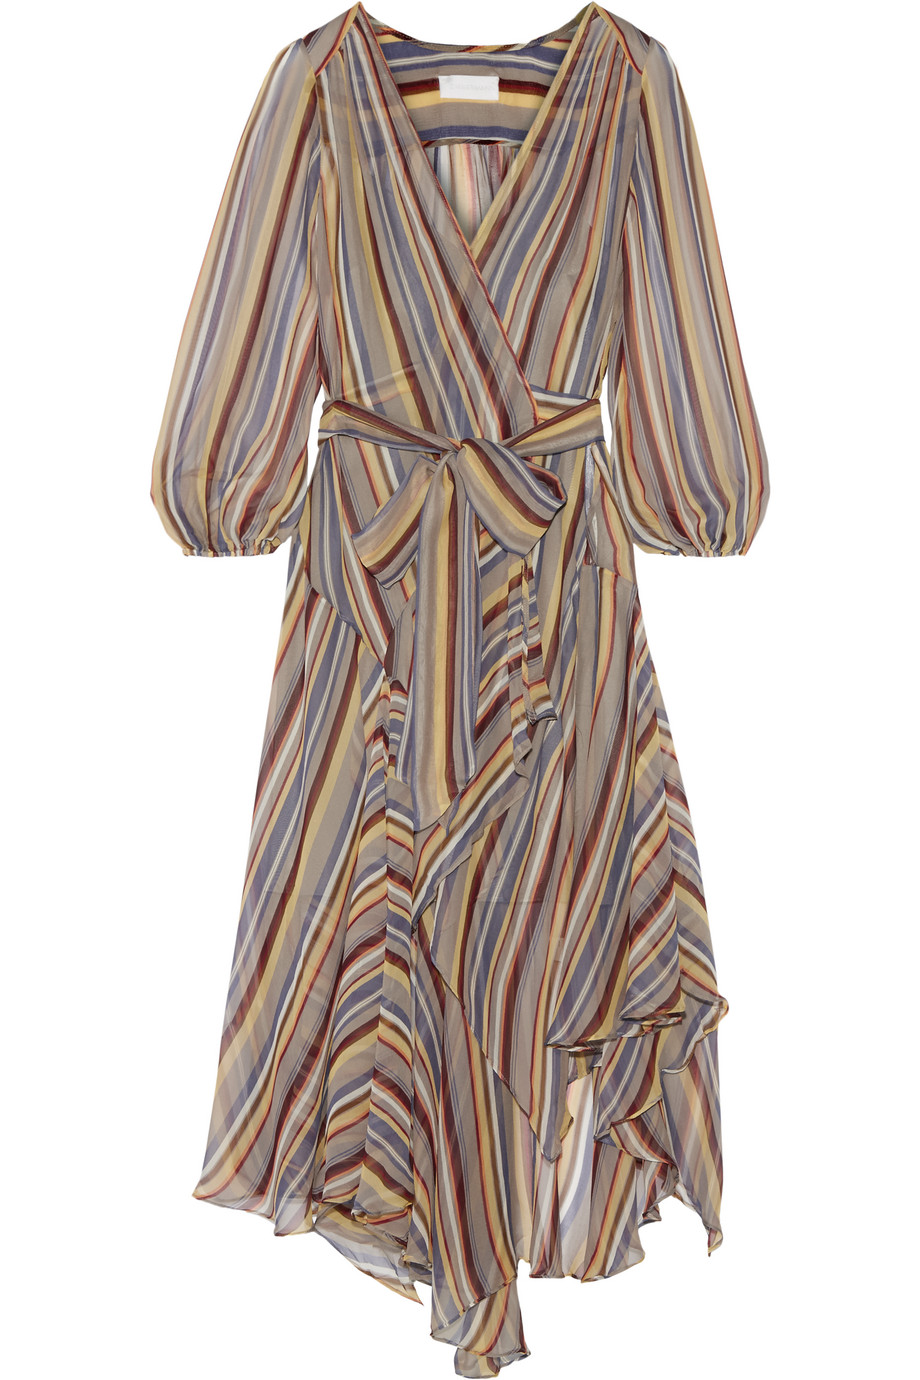 Zimmermann Ticking Striped Silk-Crepe Wrap Midi Dress, Gray, Women's - Striped, Size: 0